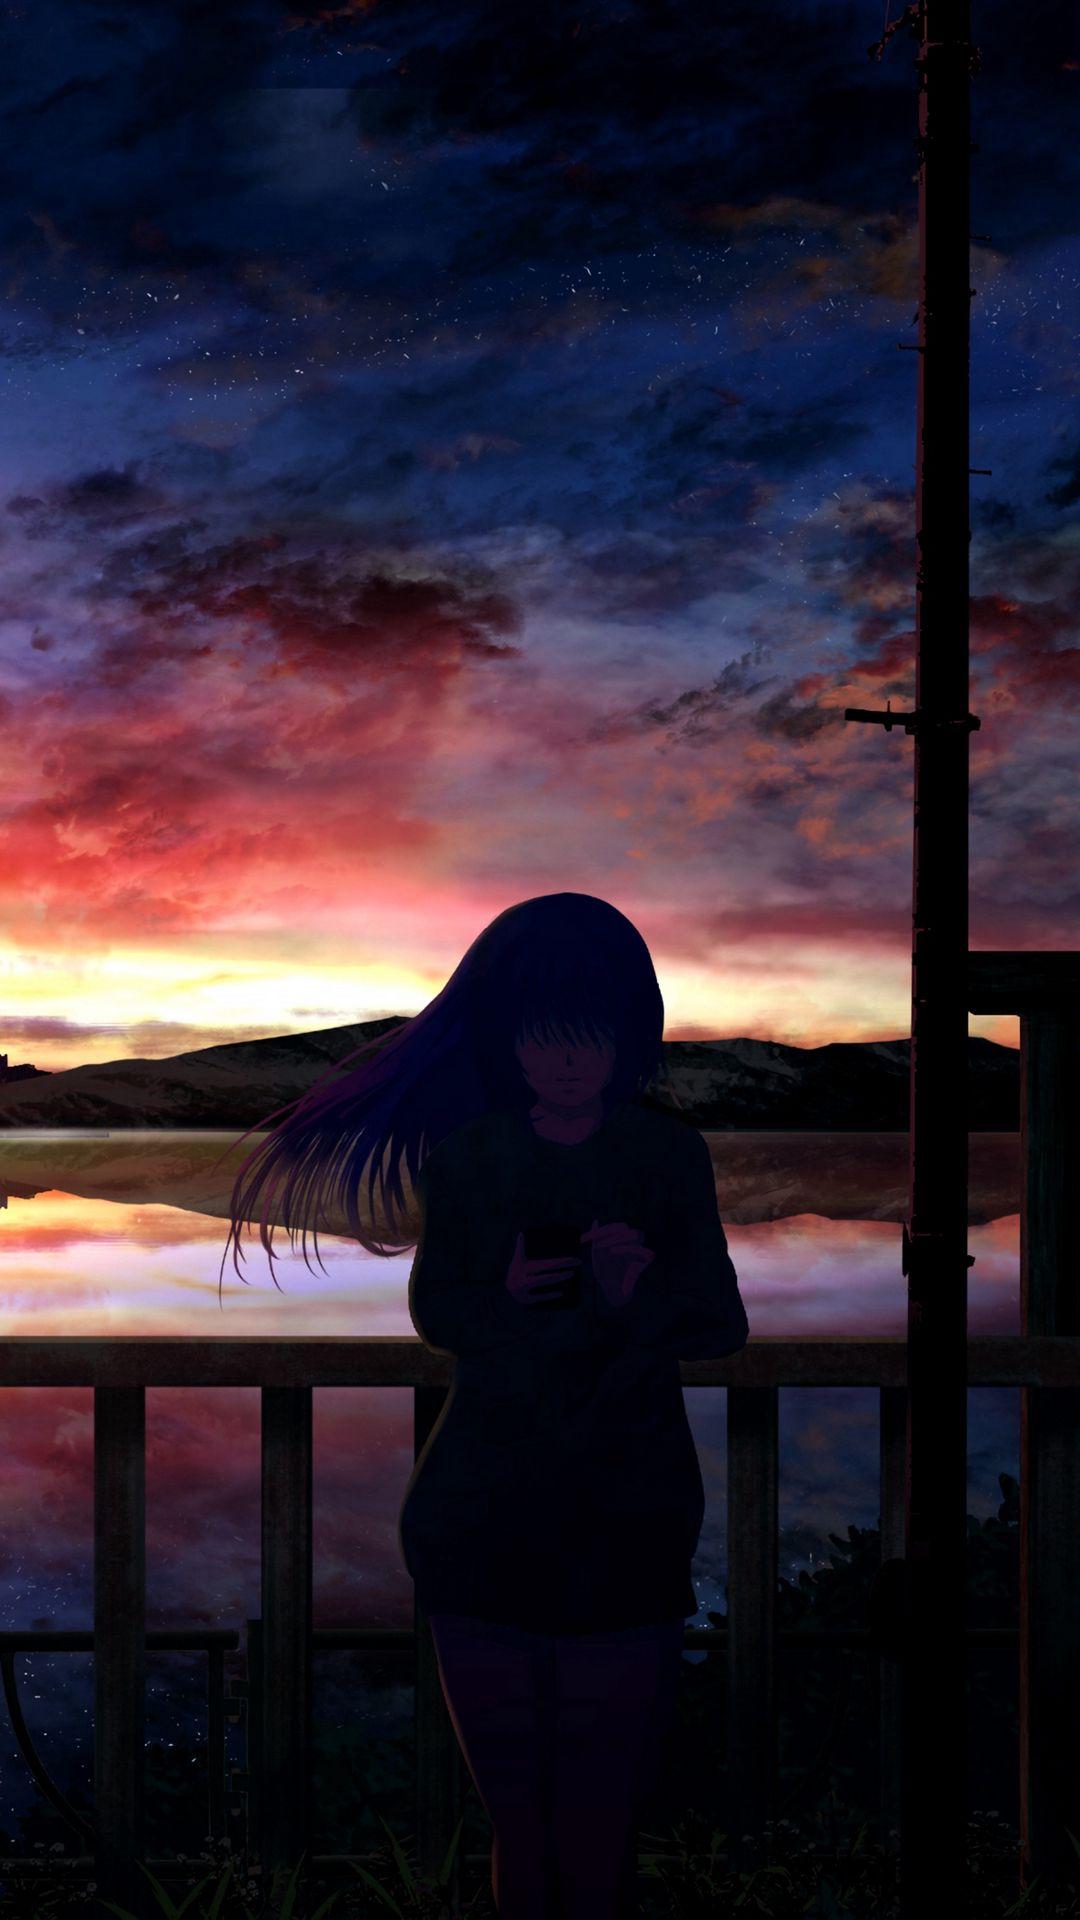 1080x1920 Wallpaper silhouette, night, starry sky, girl, anime